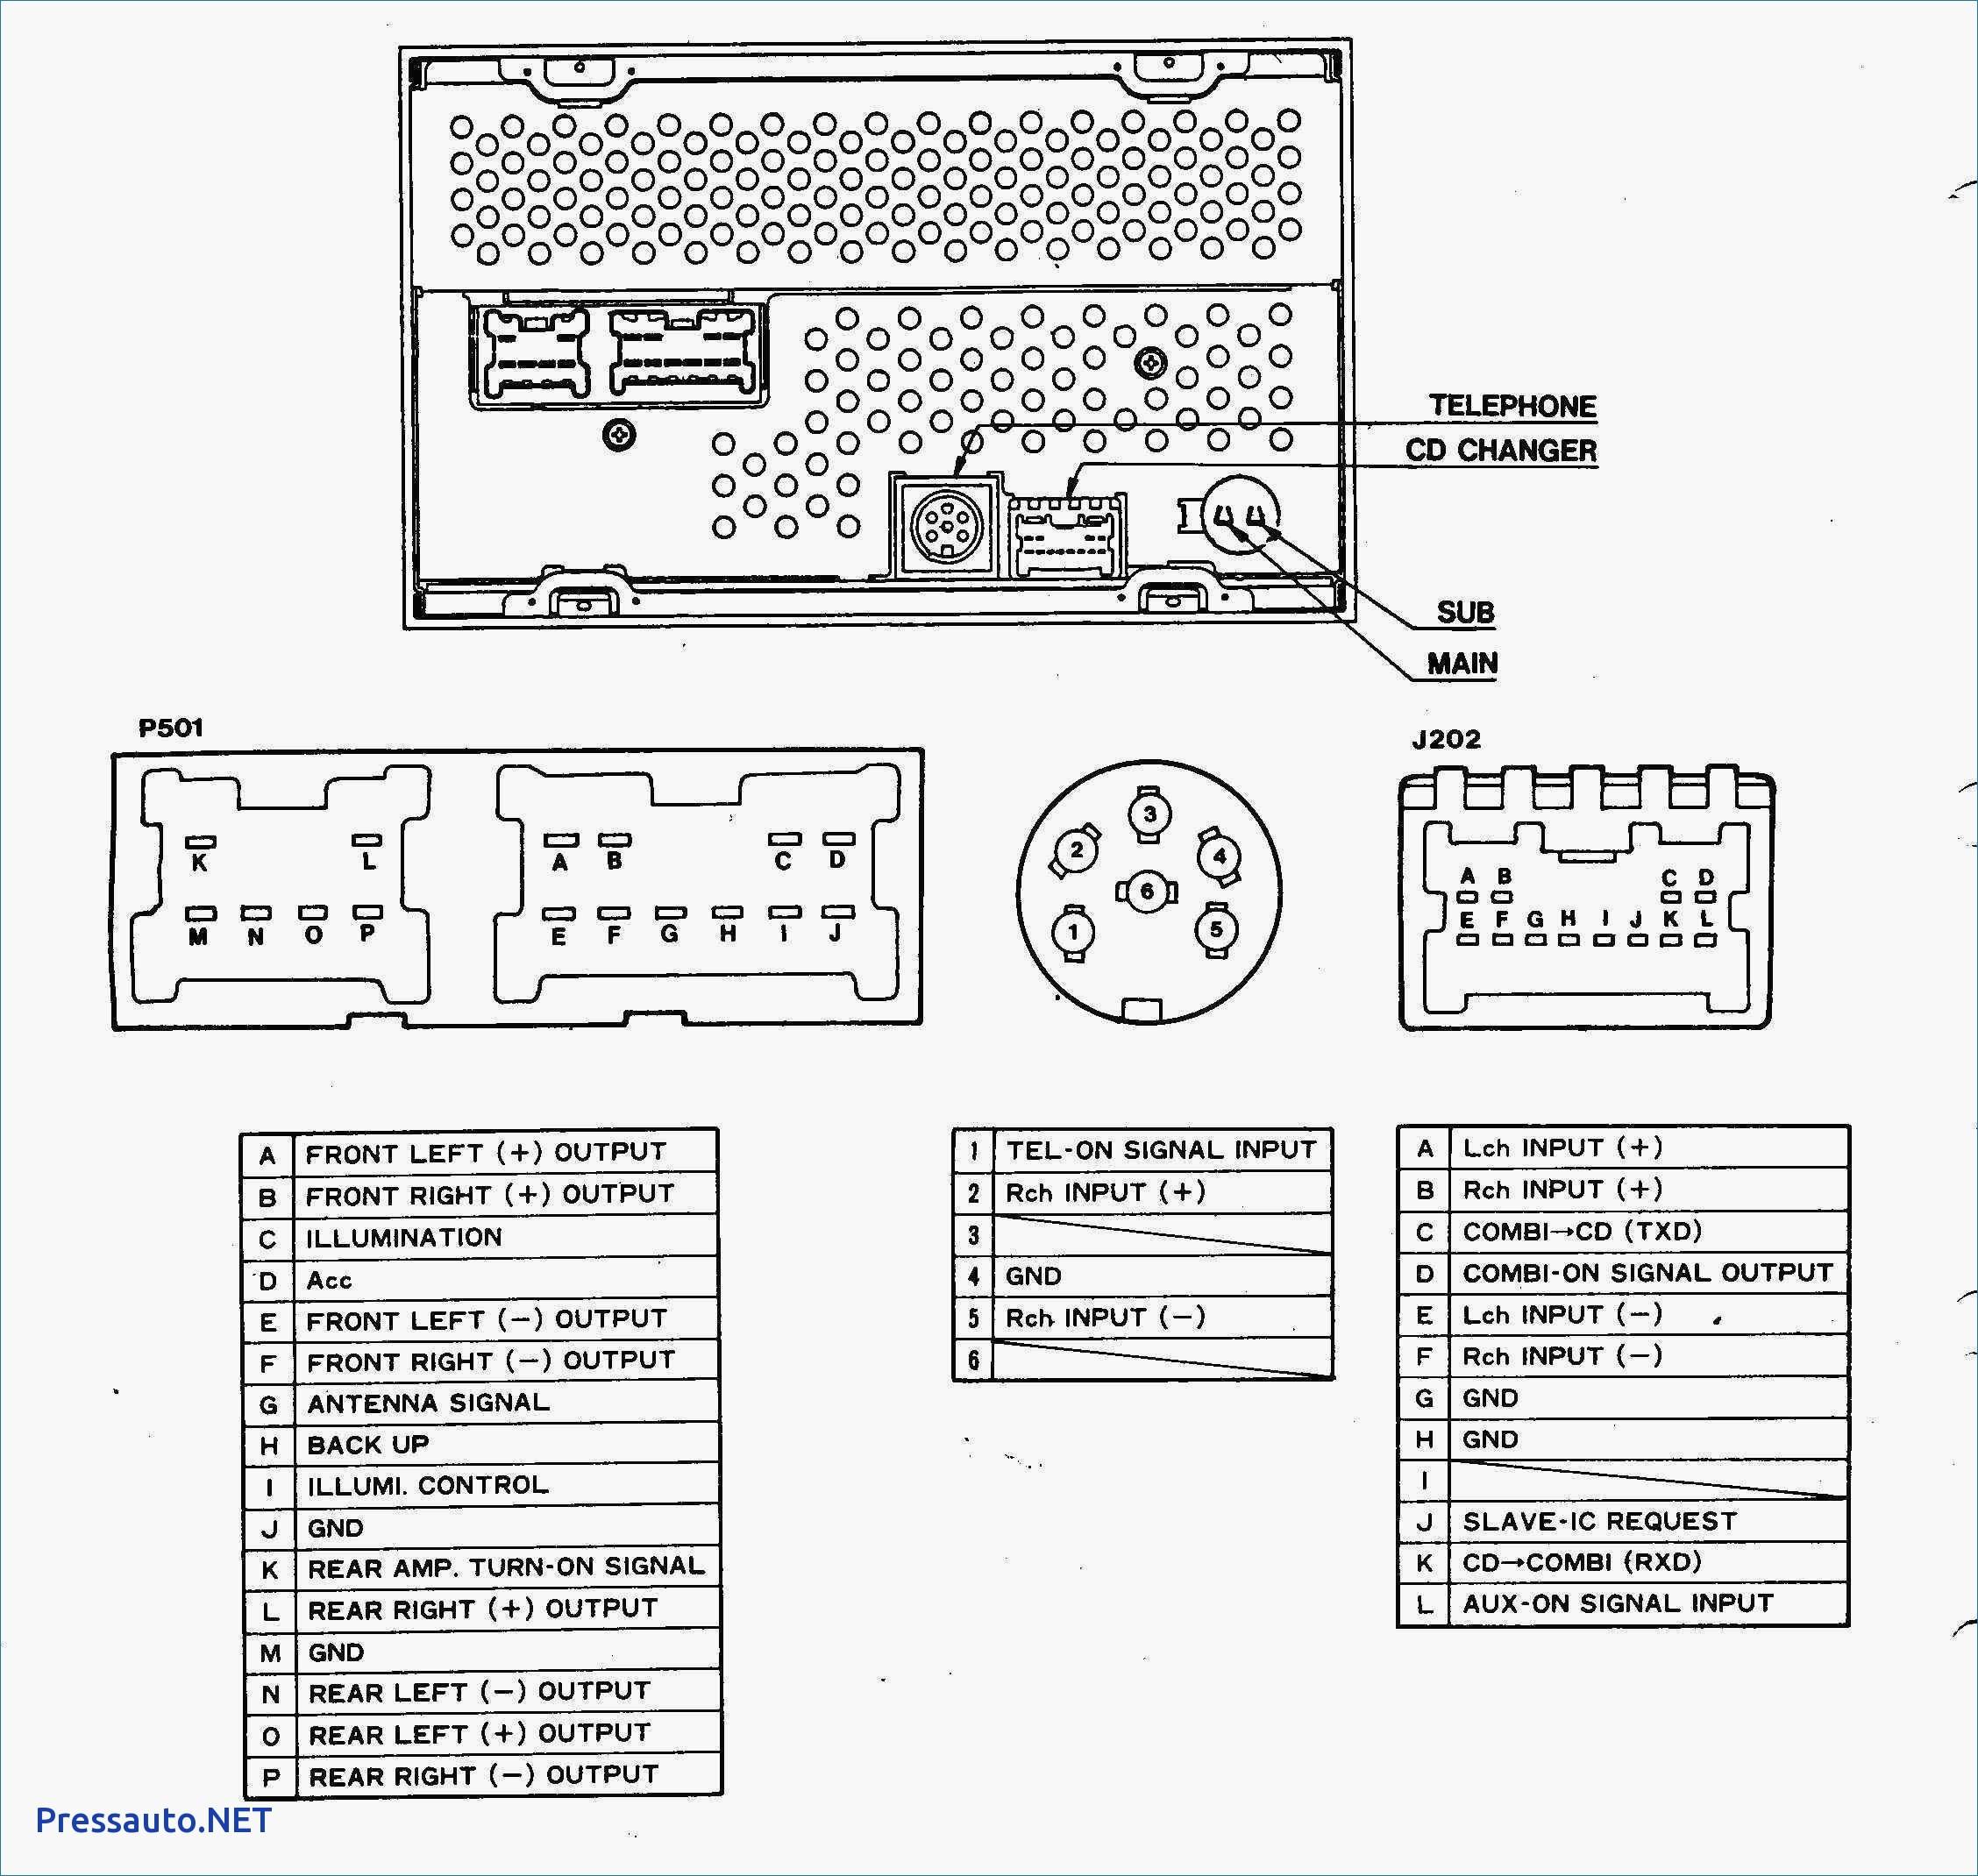 2003 Jetta Stereo Wiring Diagram 25 Evinrude Ignition Wiring Diagram Air Bag Tukune Jeanjaures37 Fr